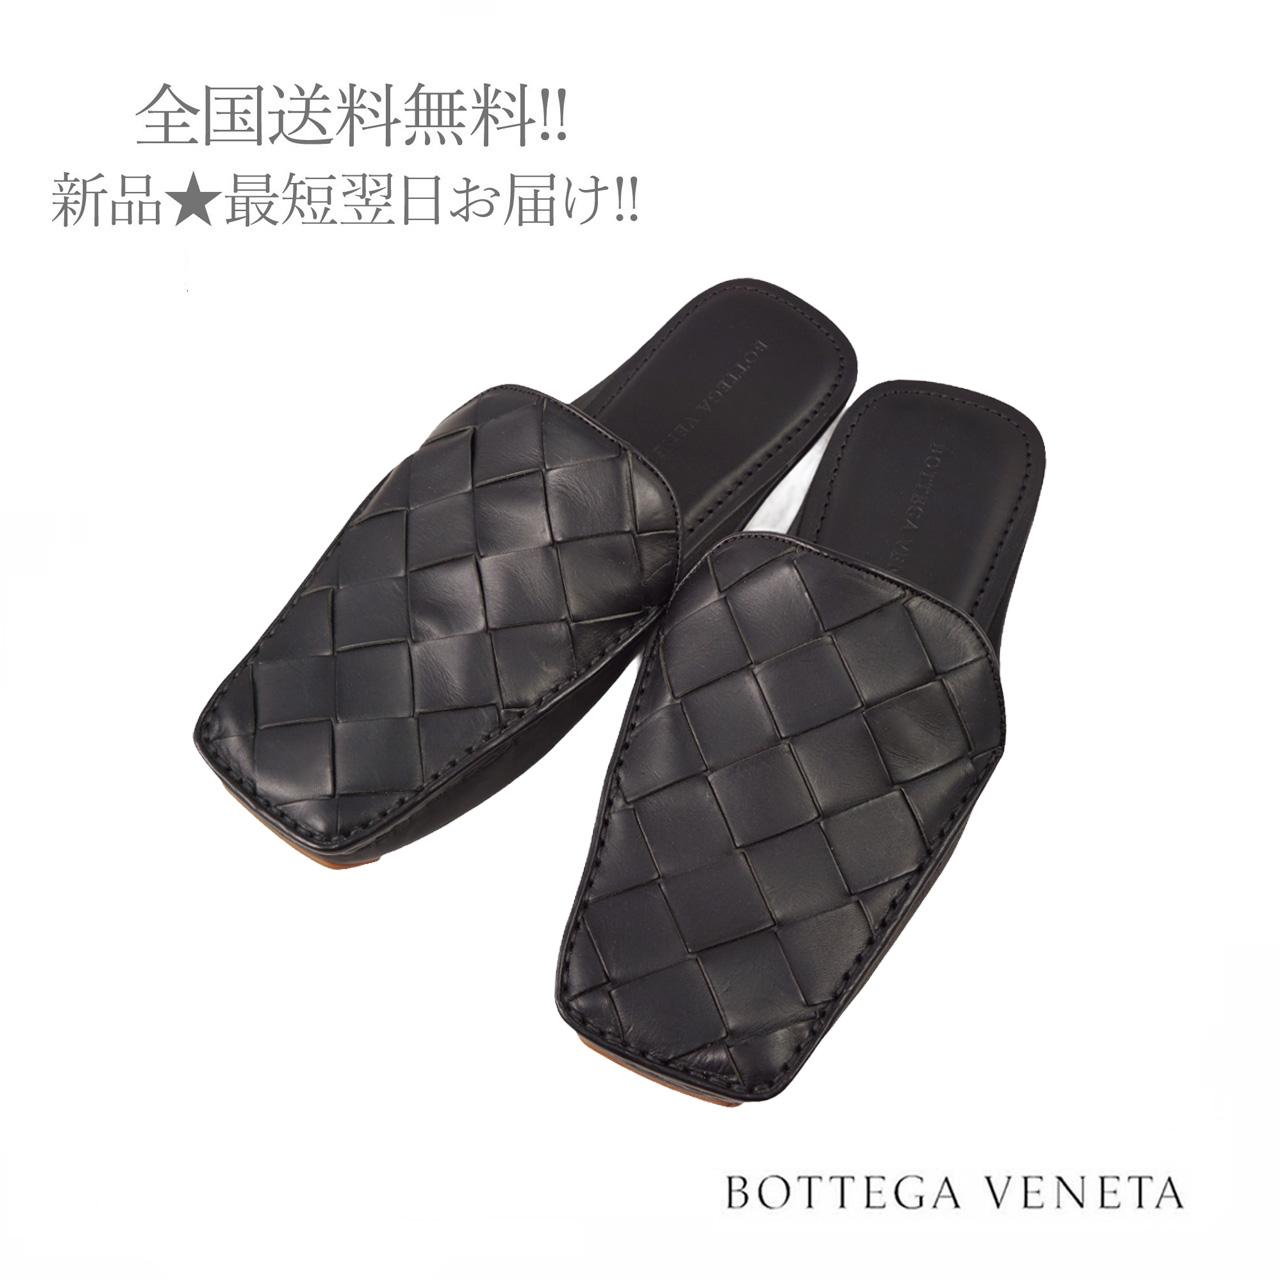 BOTTEGA VENETA ボッテガヴェネタ イタリア製 レザー イントレ 新色 サンダル メンズ 1000 ブラック 男 新品 訳あり品送料無料 42